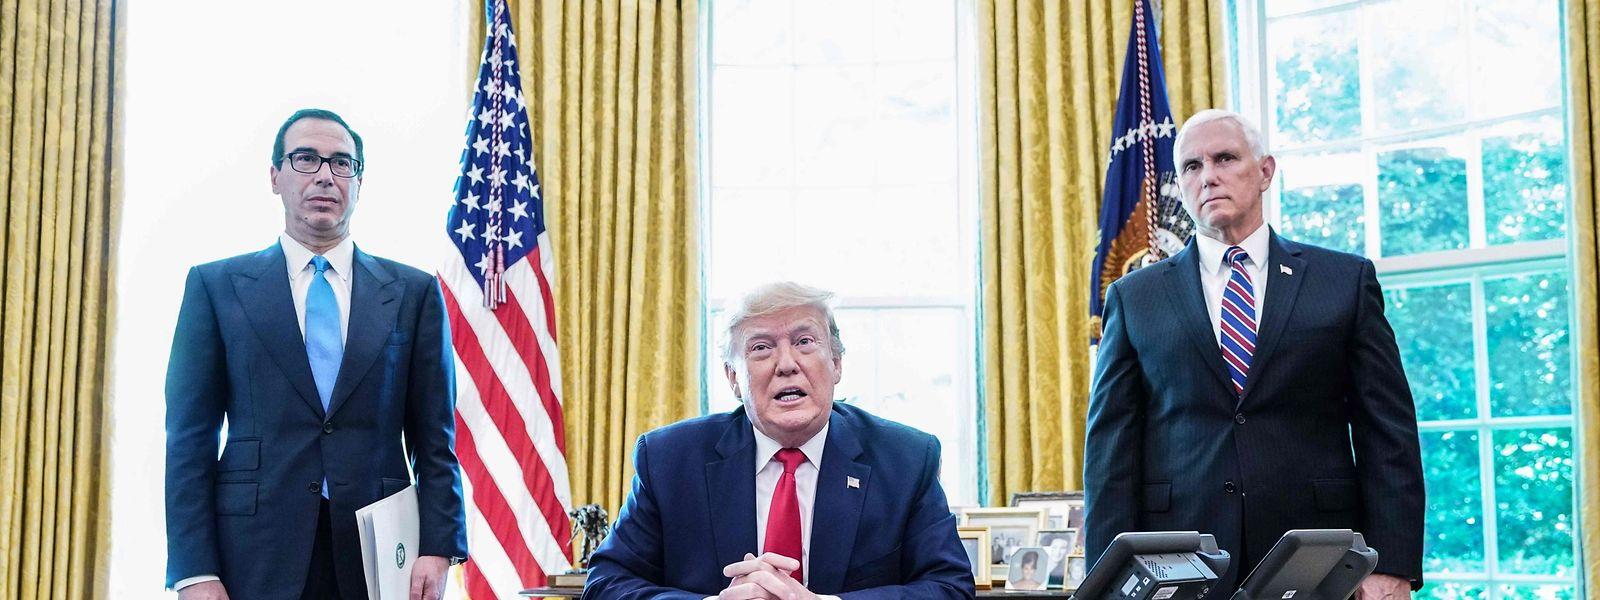 US-Präsident Donald Trump mit Vize-Präsident Mike Pence (R) und Finanzminister Steven Mnuchin vor der Verkündung der neuen Sanktionen gegen den Iran.